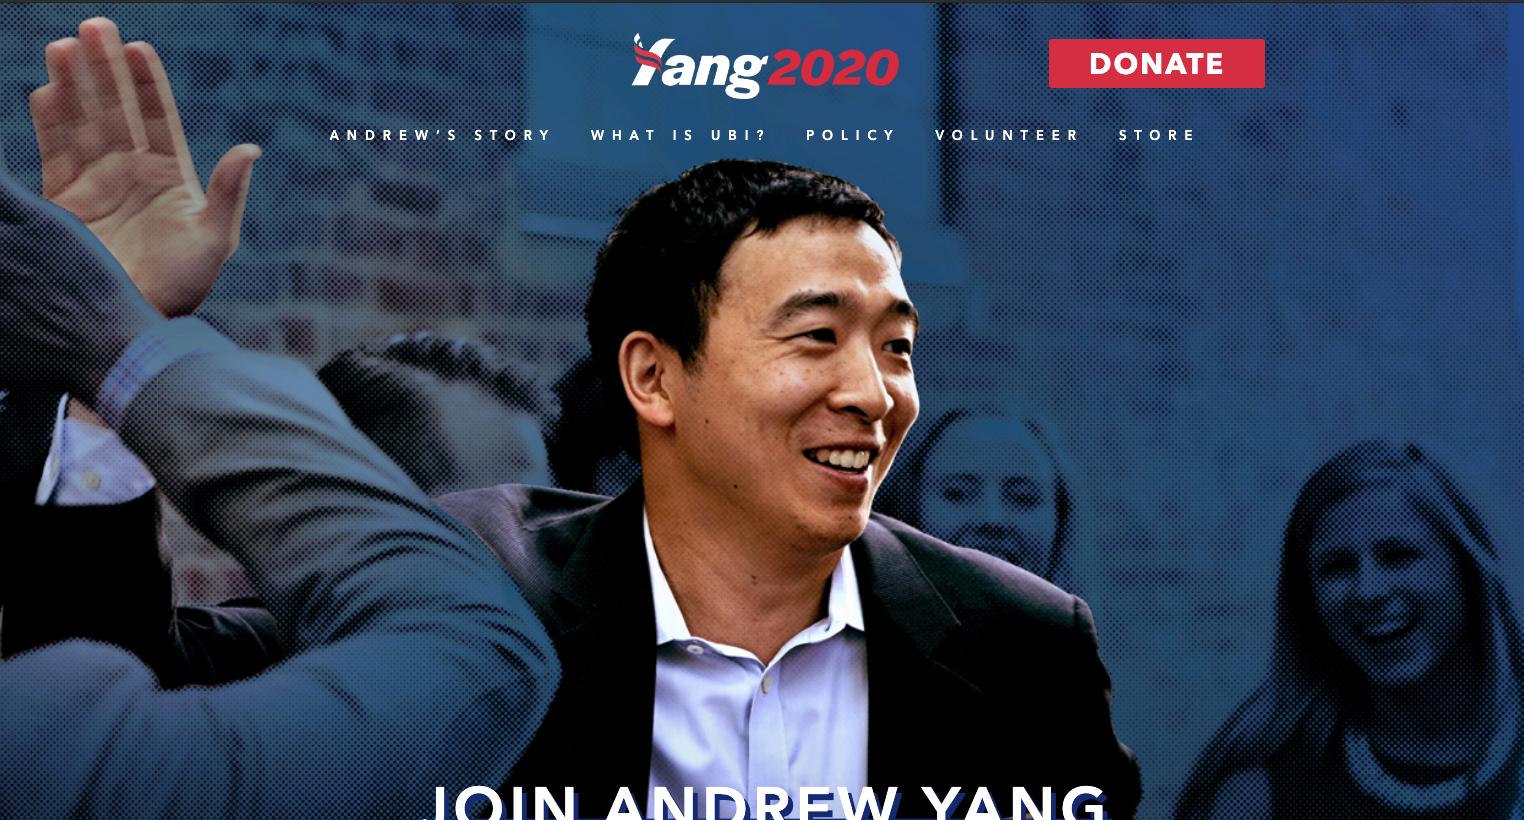 Andrew Yang Website